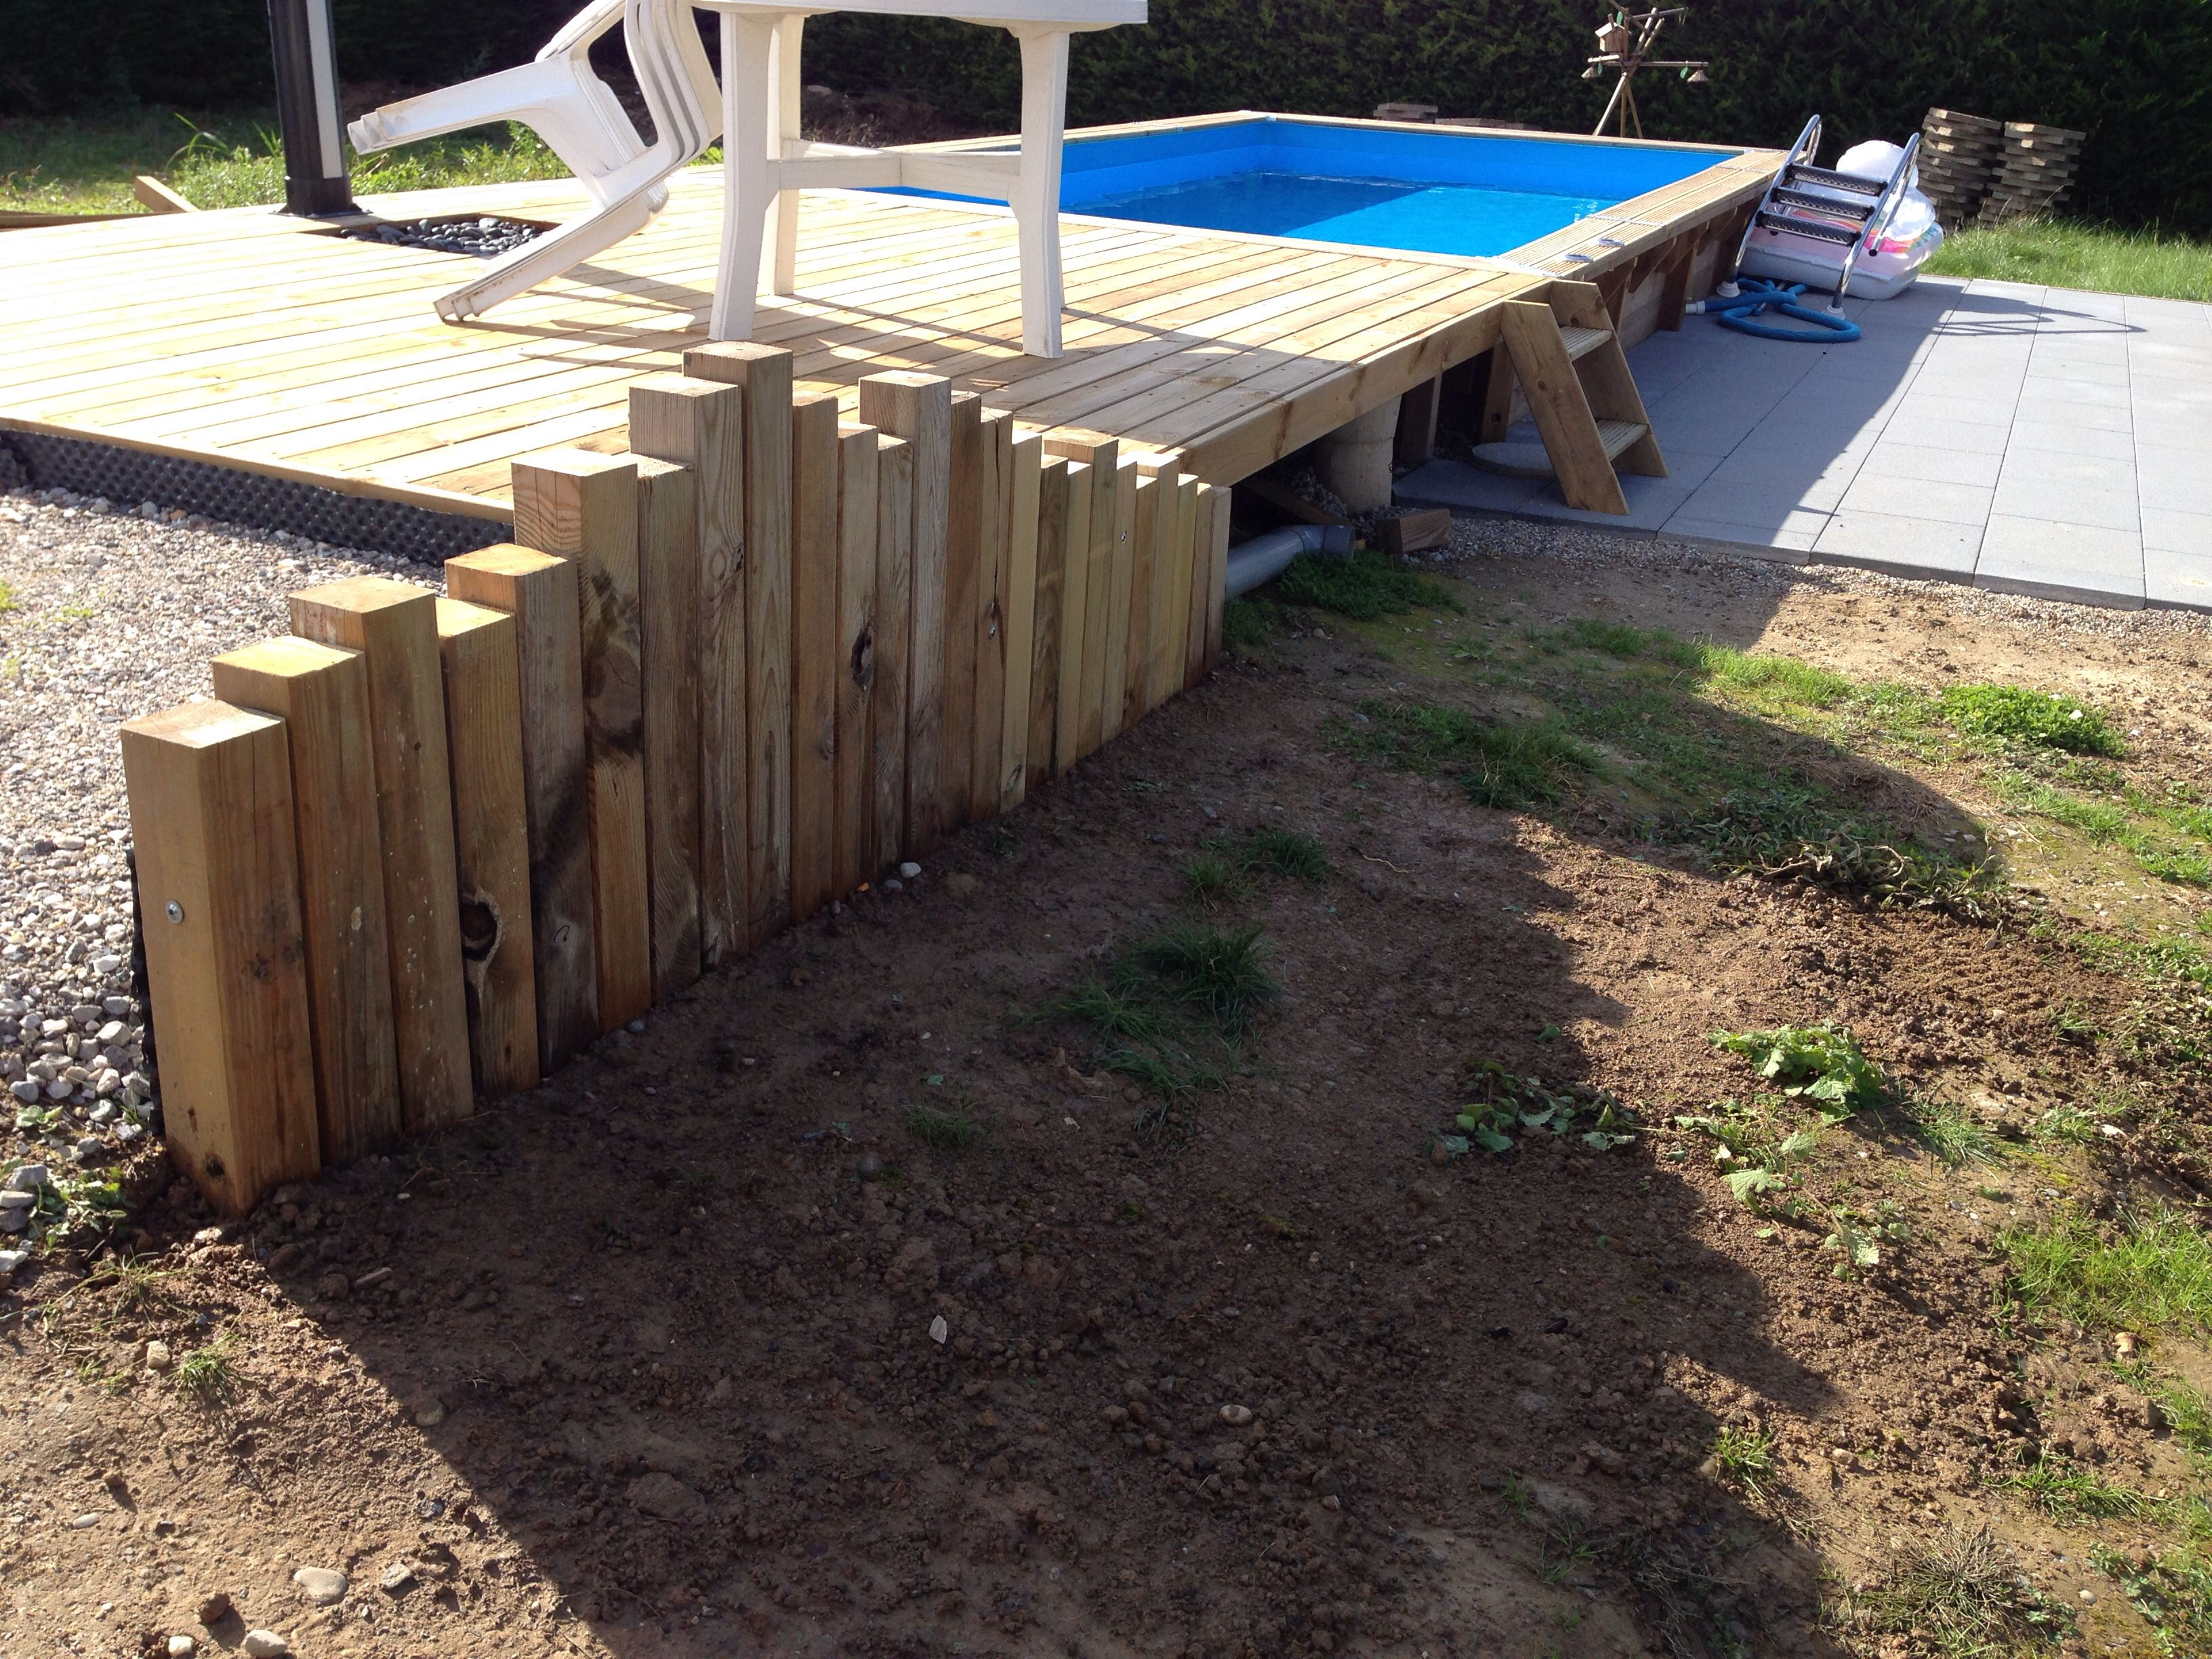 retenue de terre jardinage pinterest de terre terre et jardinage. Black Bedroom Furniture Sets. Home Design Ideas